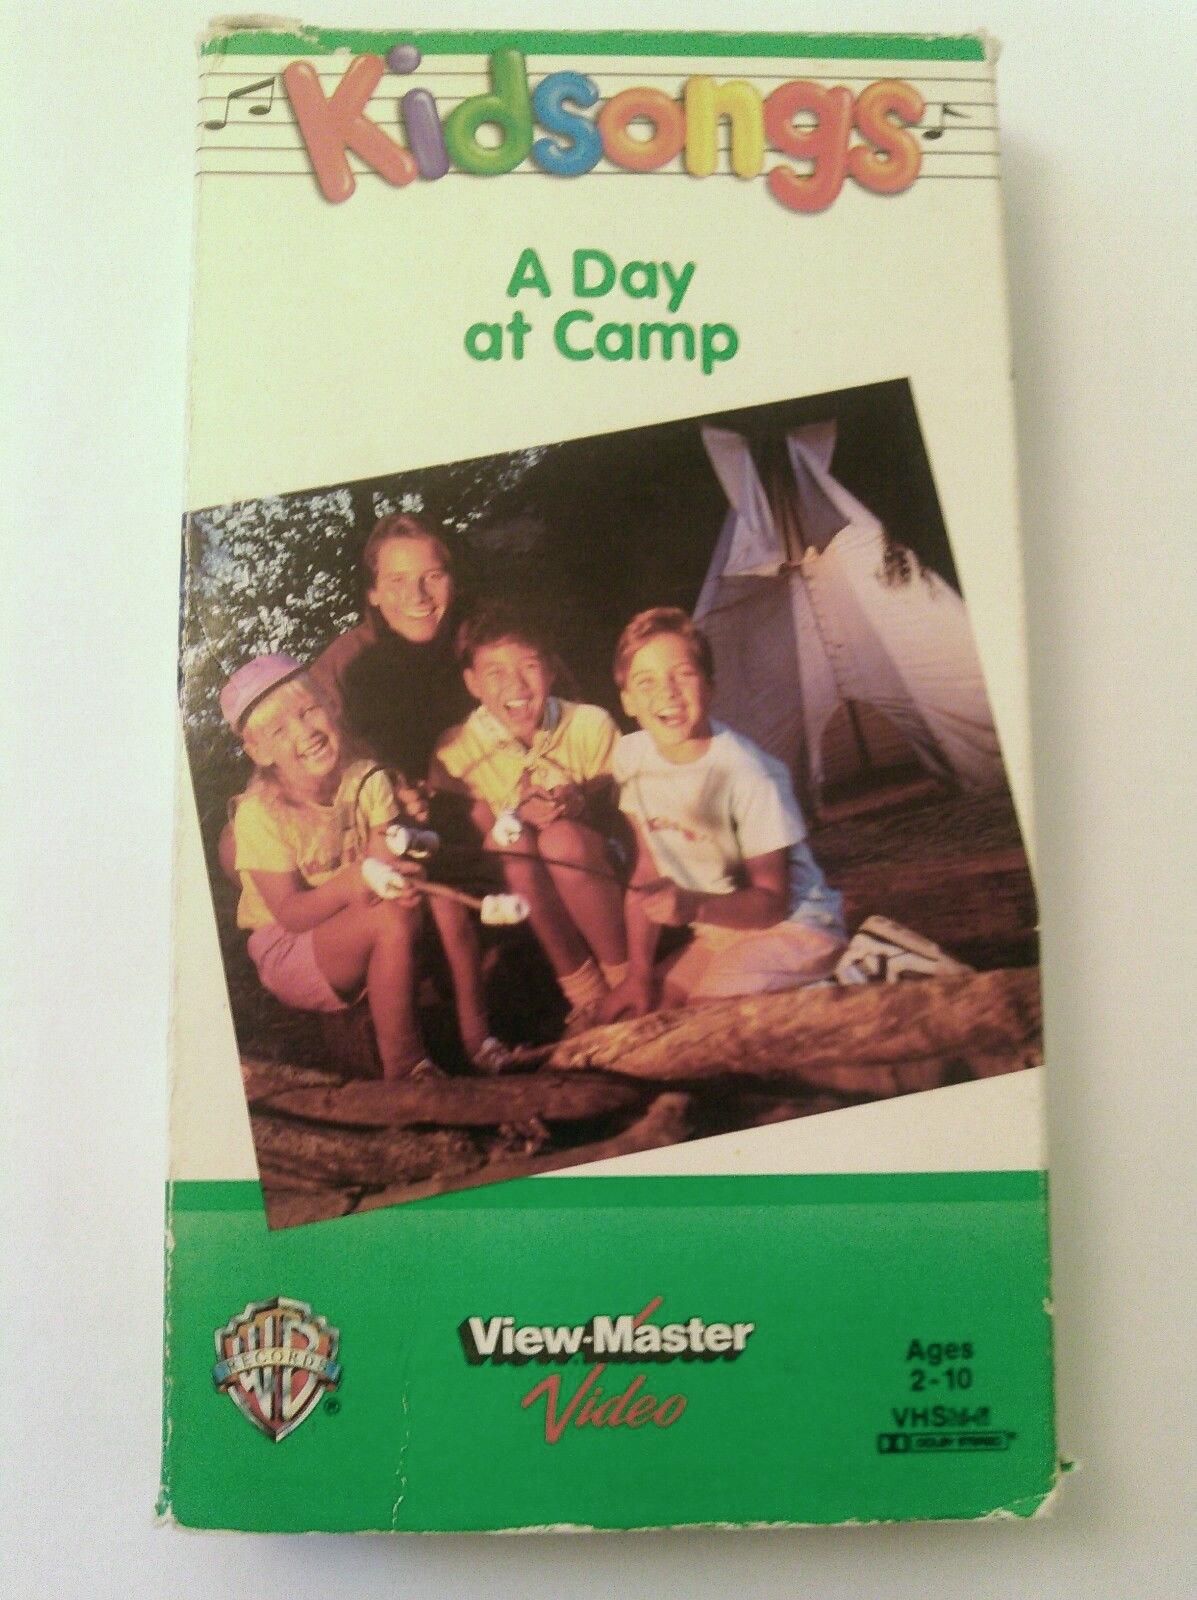 Category:1989 | Kidsongs Wiki | Fandom powered by Wikia